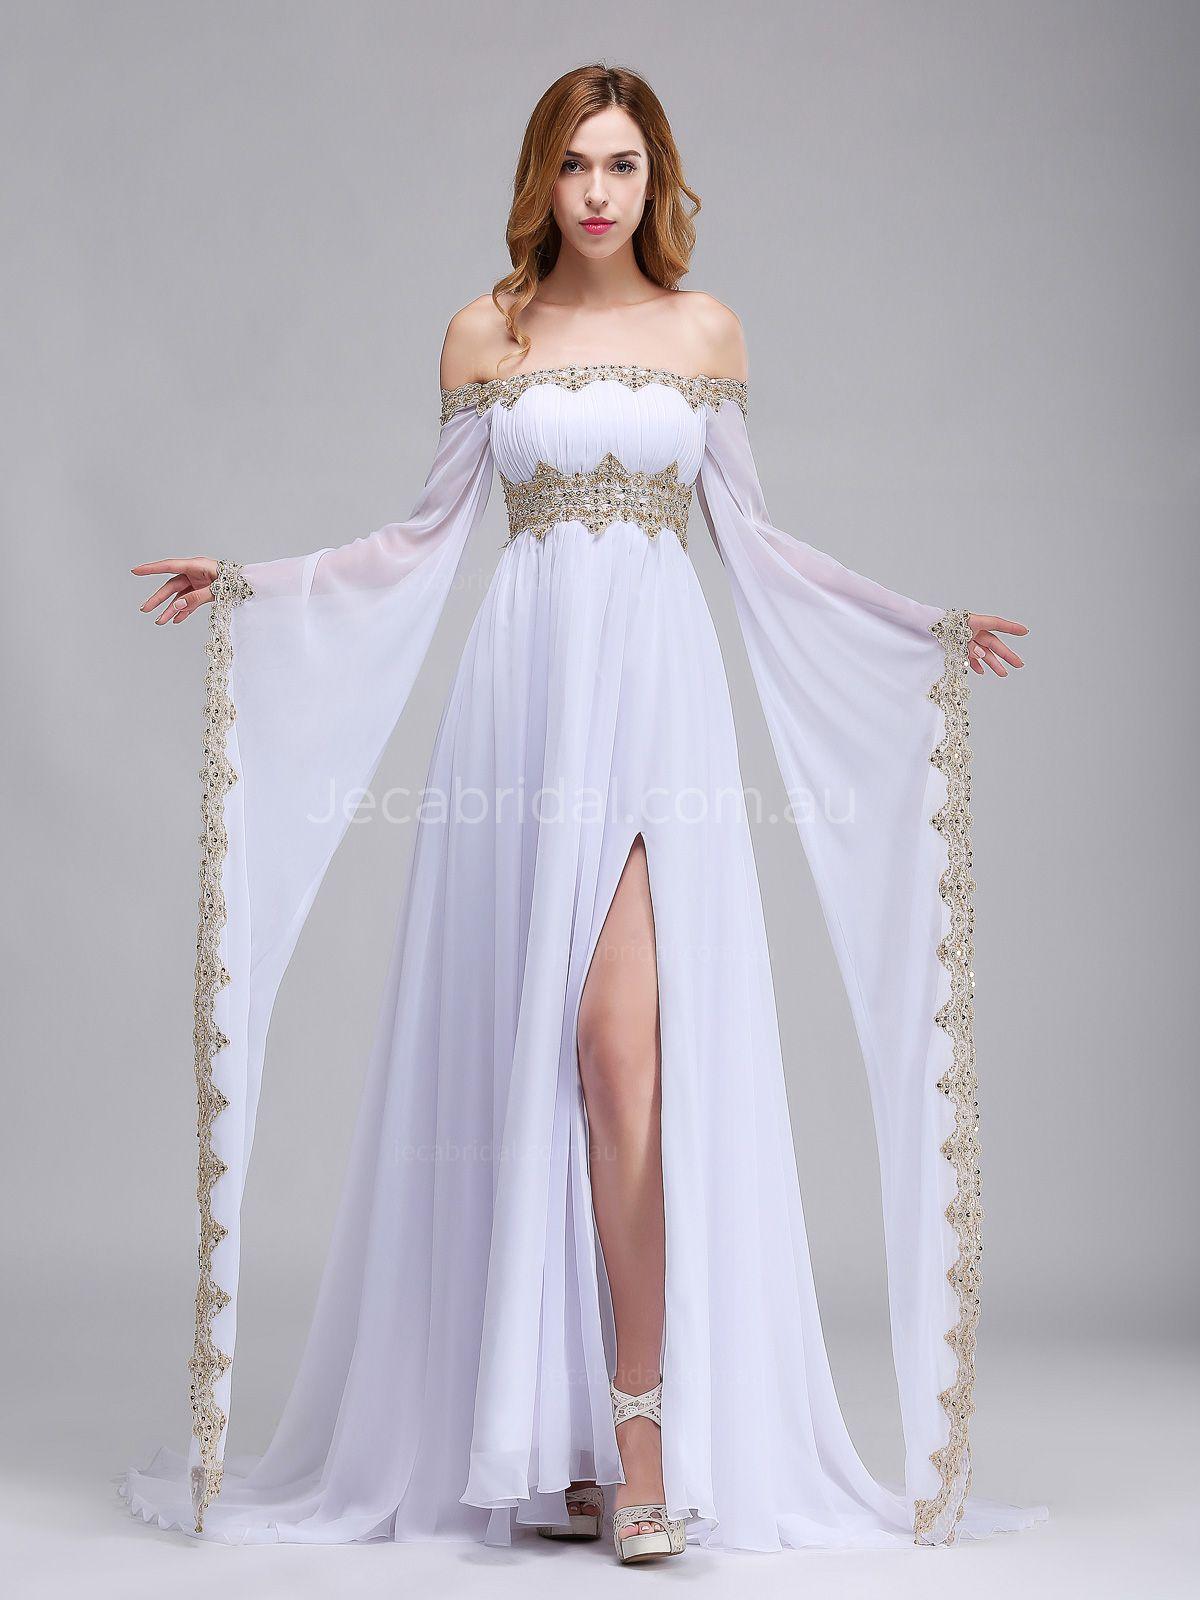 renaissance wedding dresses photo - 1